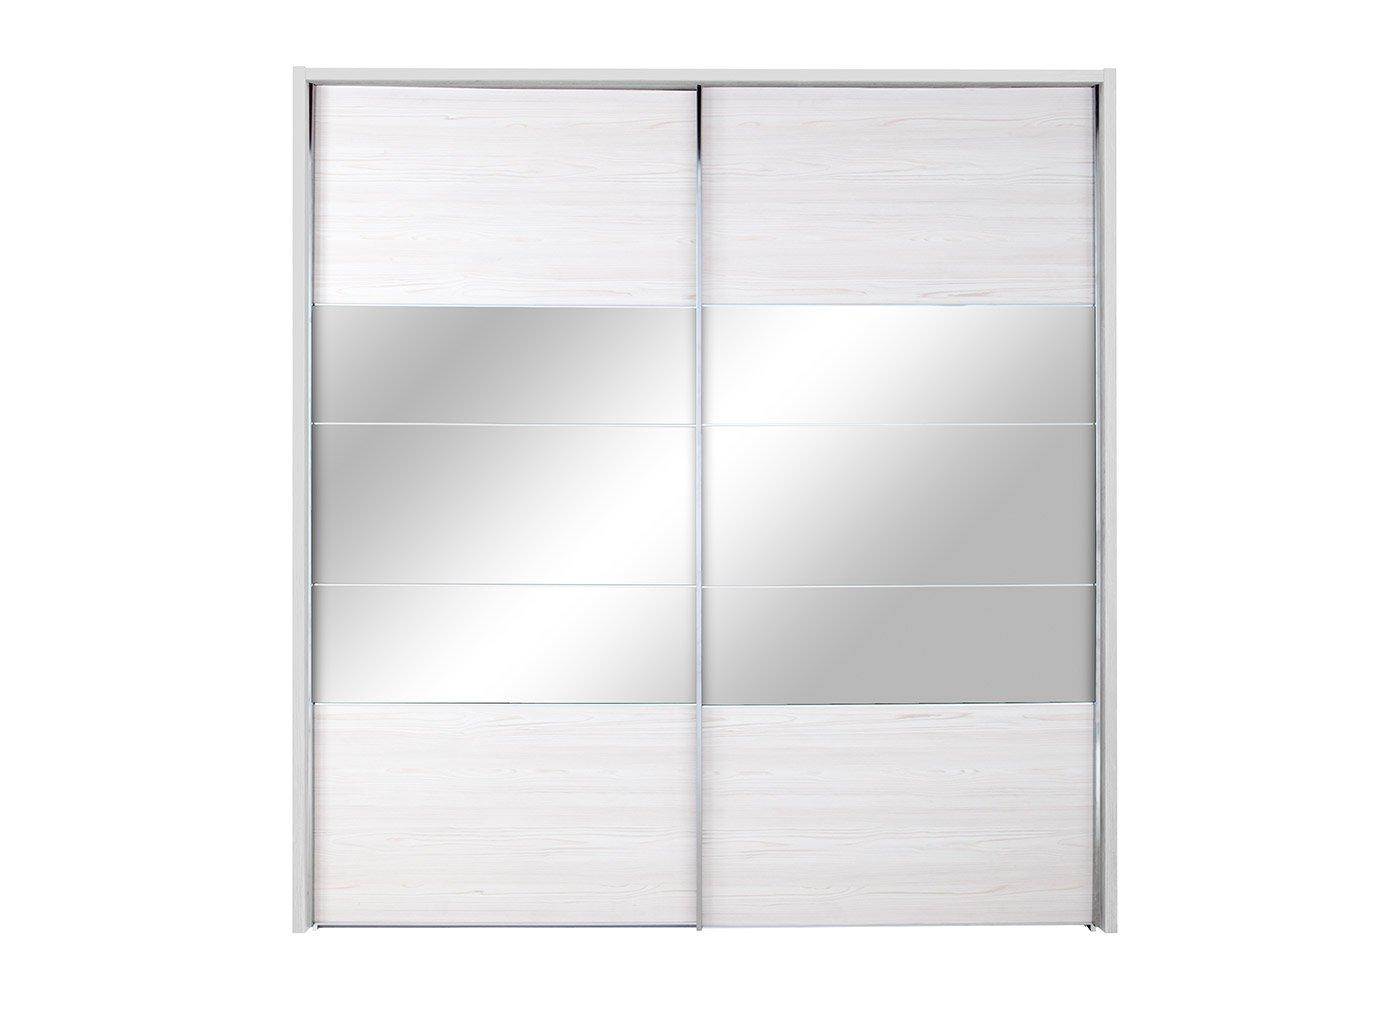 Fiji 2 Door Sliding Wardrobe Polar - Large WHITE